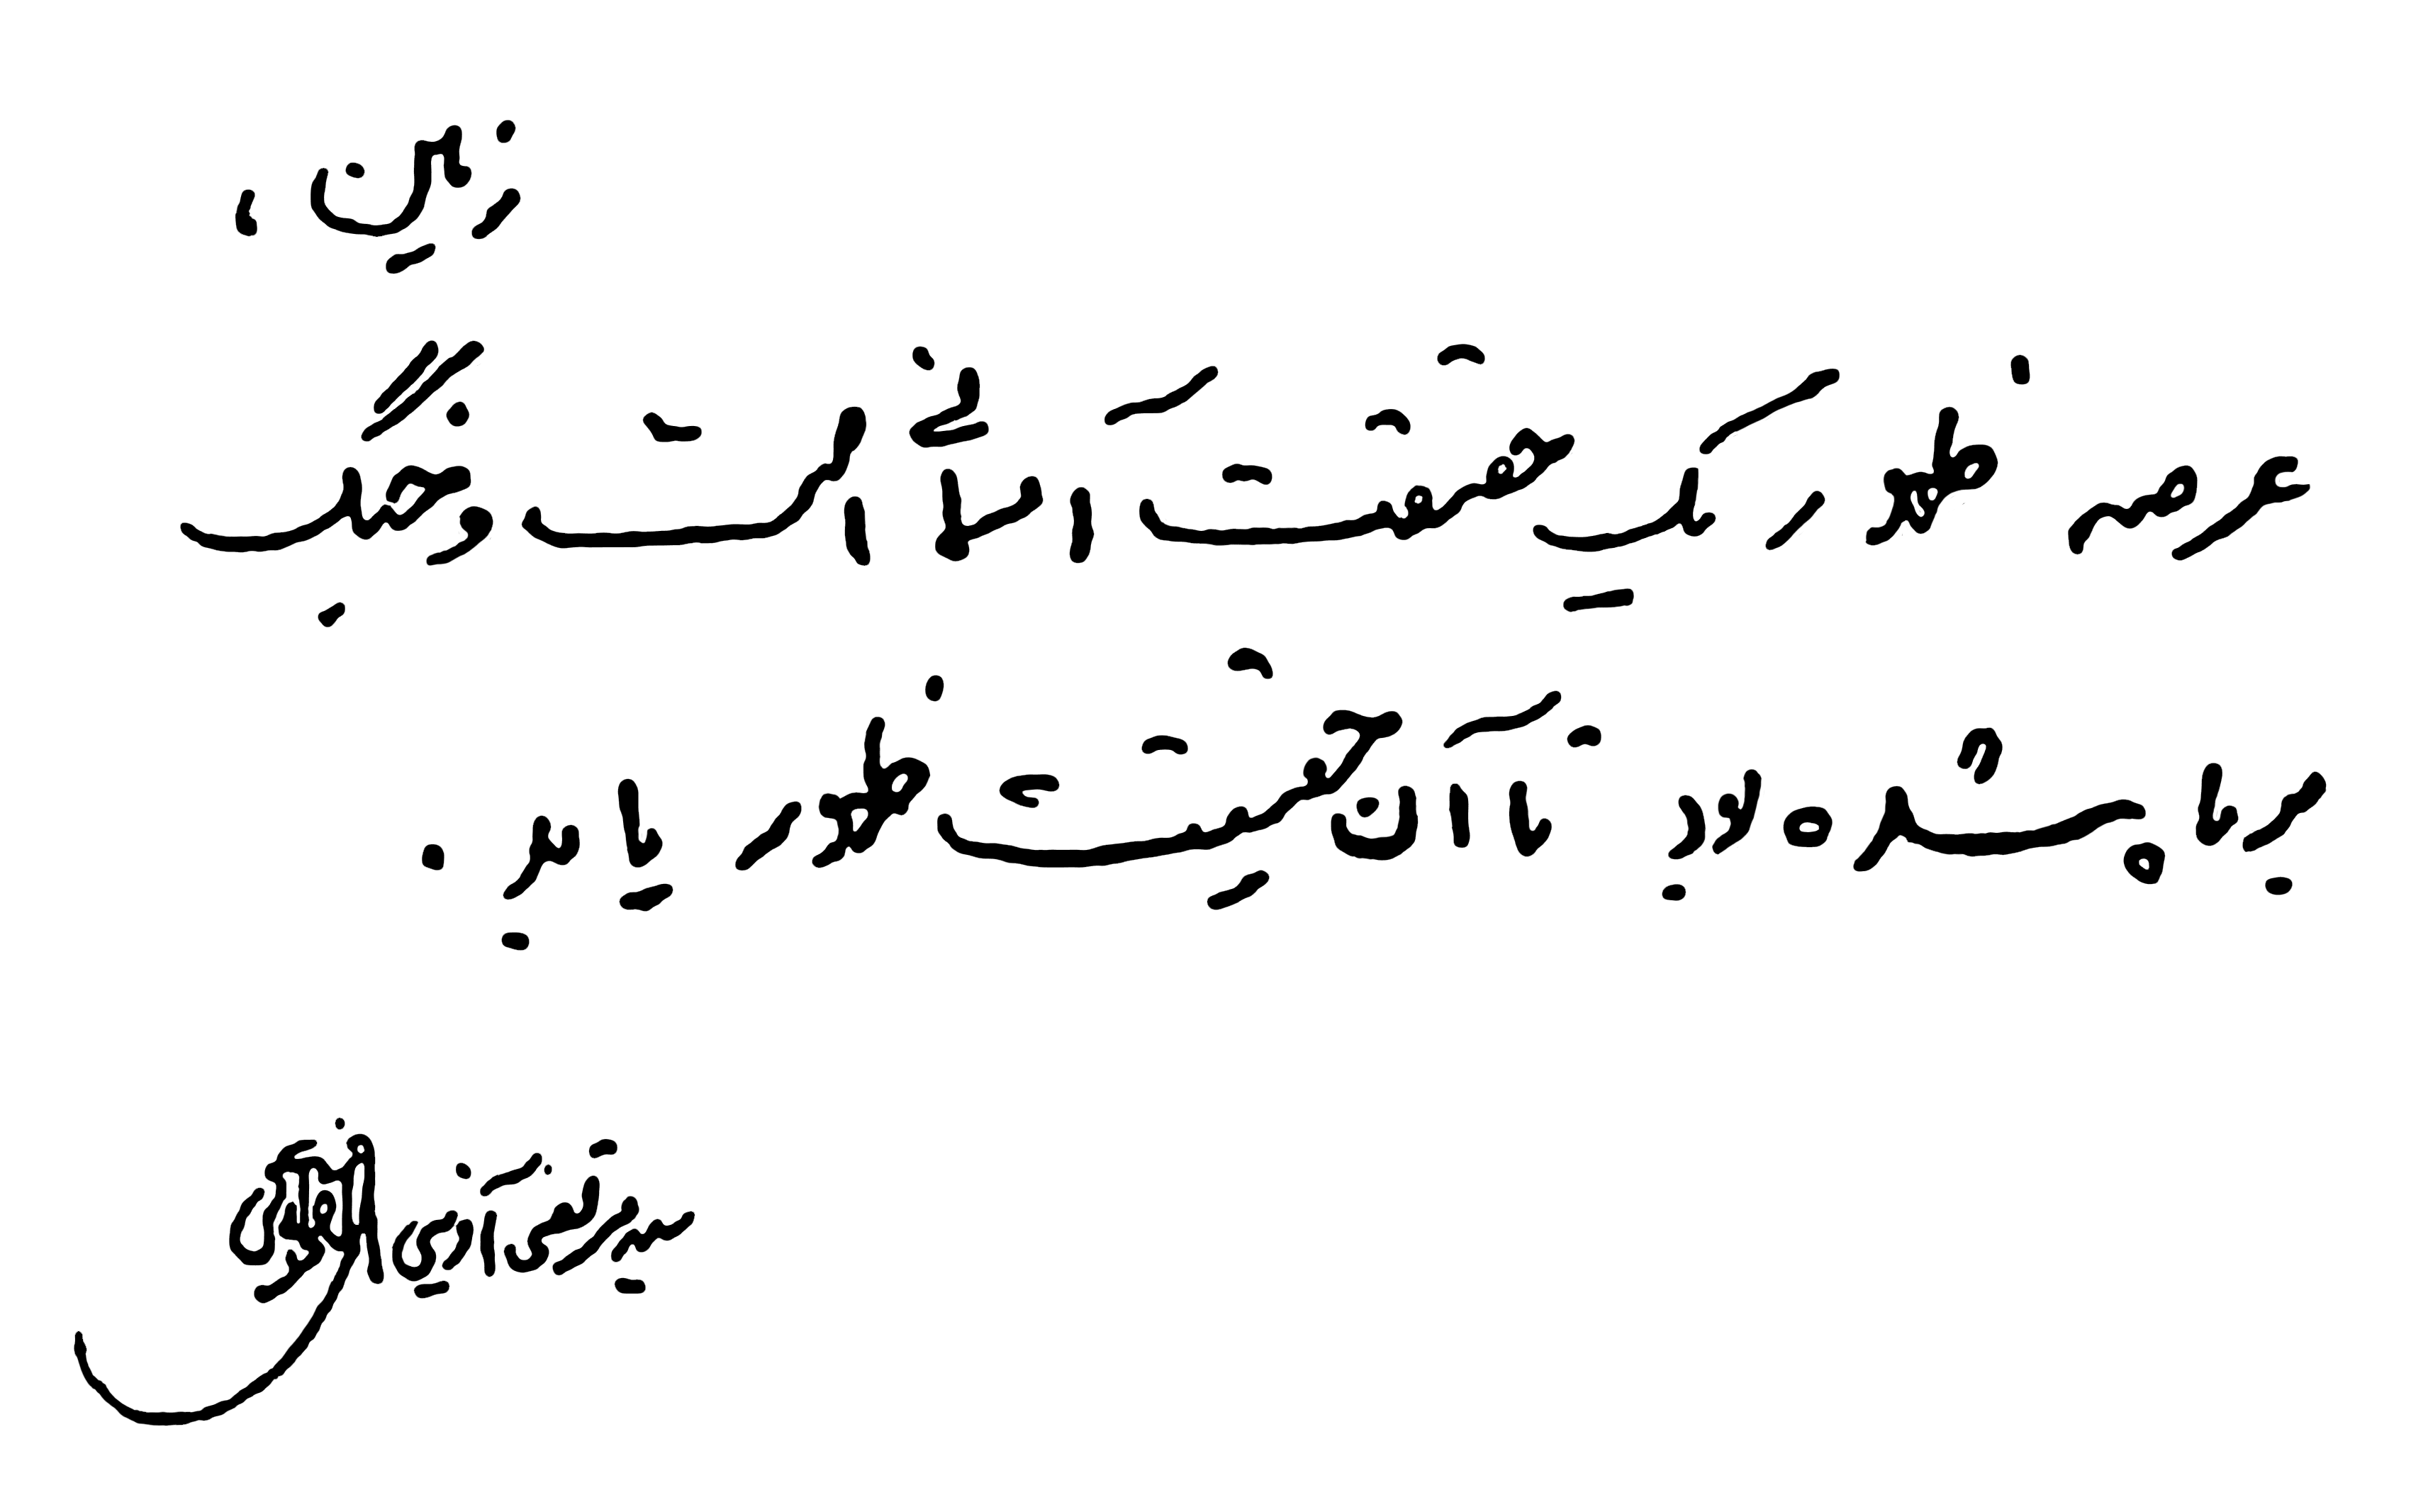 http://dl.aviny.com/Album/defa-moghadas/Shakhes/aviny/DAST_NEVESHTEH/kamel/14.png